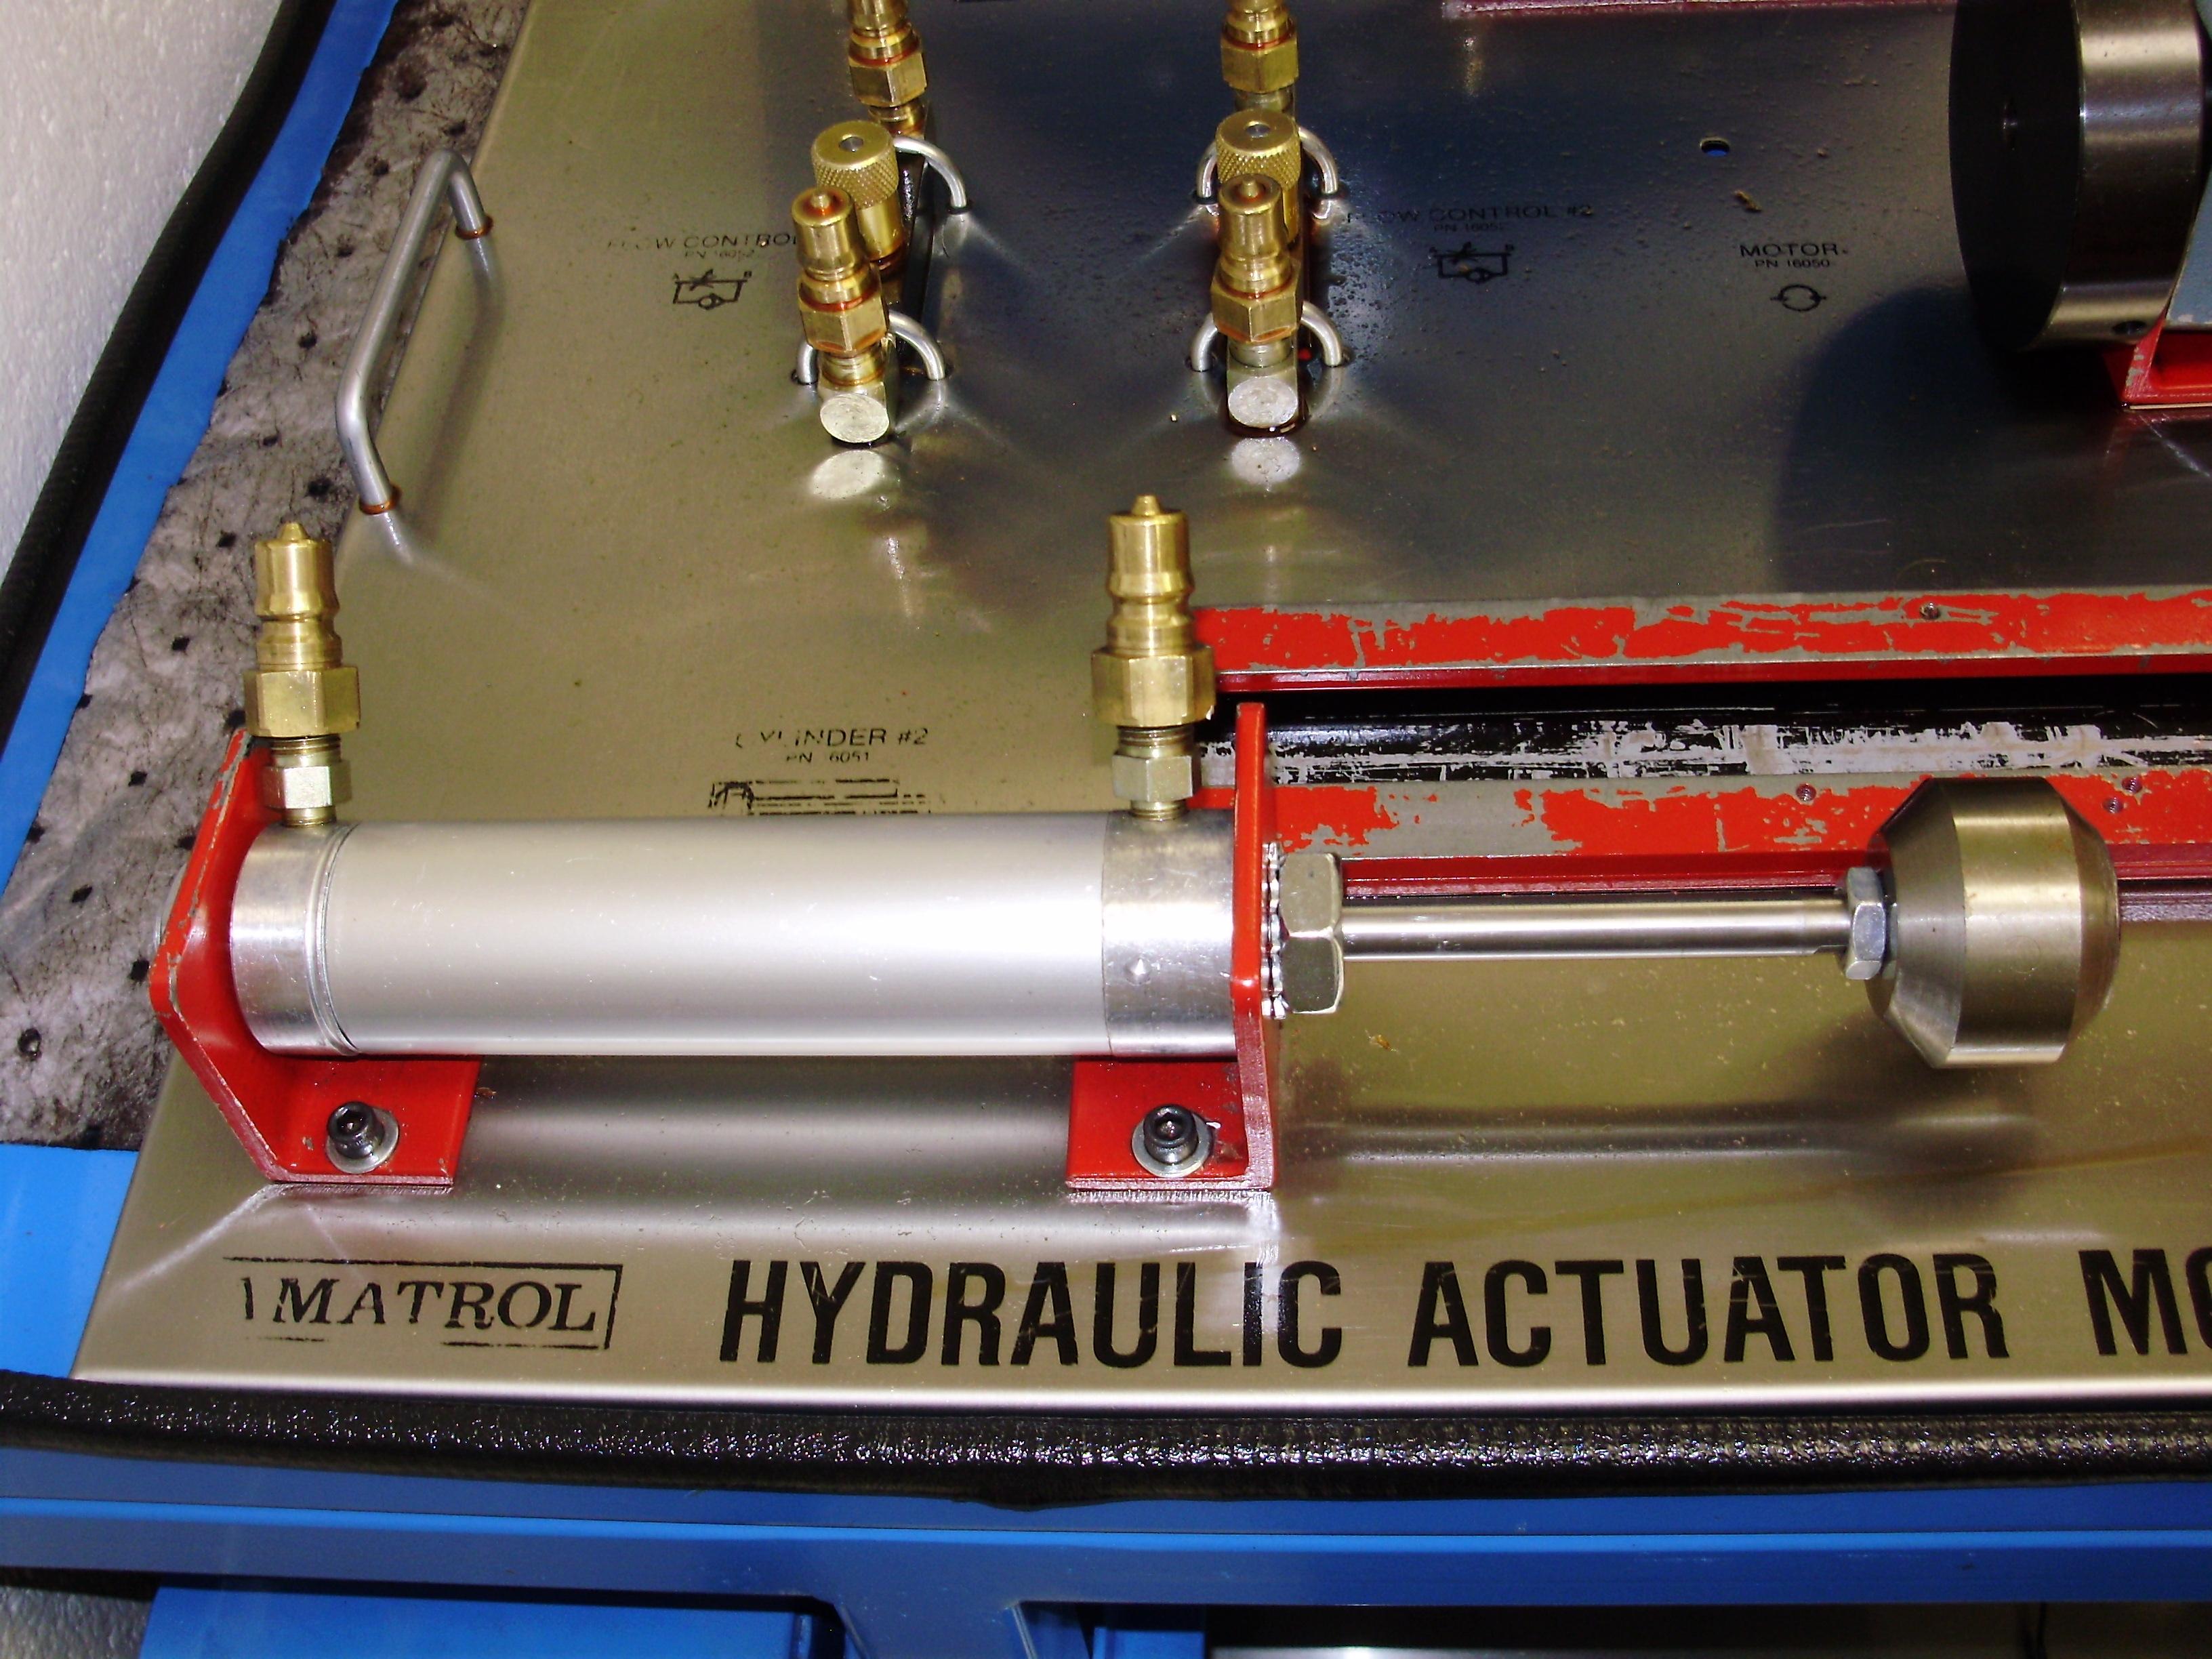 Hydraulic actuator P7070052 - Wisc-Online OER